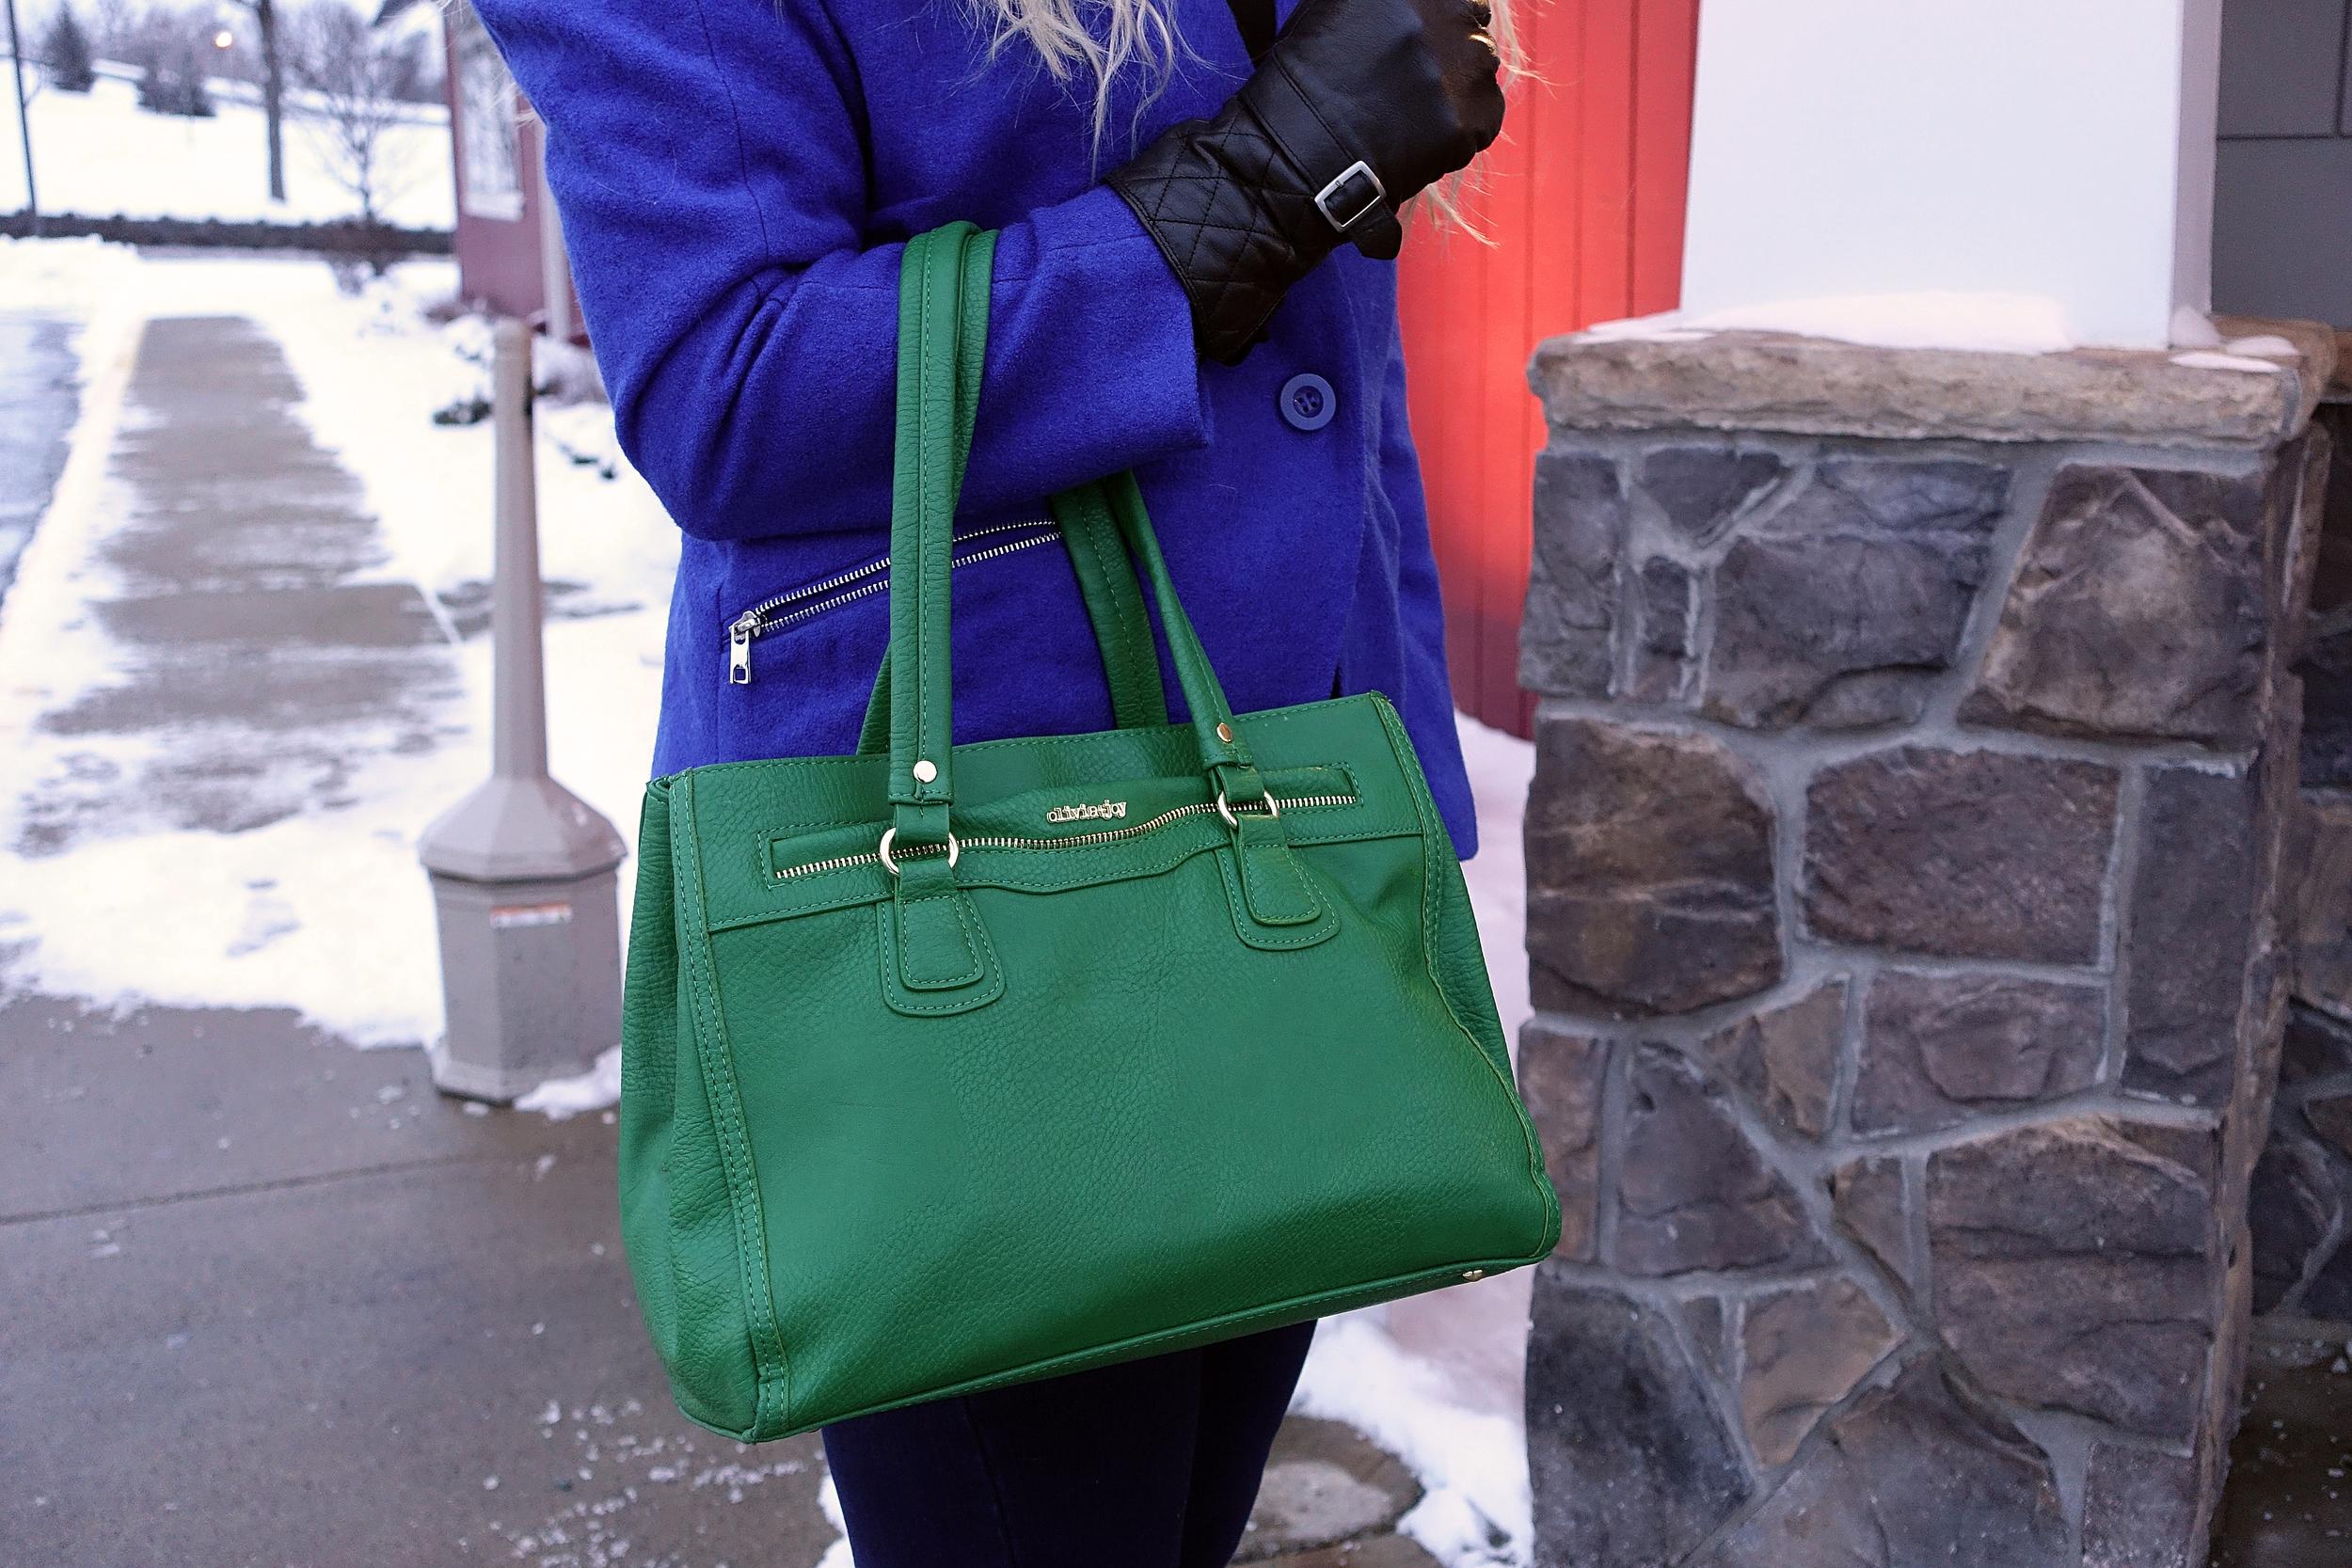 Handbag is Oliva+Joy. Find one you love here:  http://www1.macys.com/shop/handbags-accessories/olivia-and-joy?id=54526